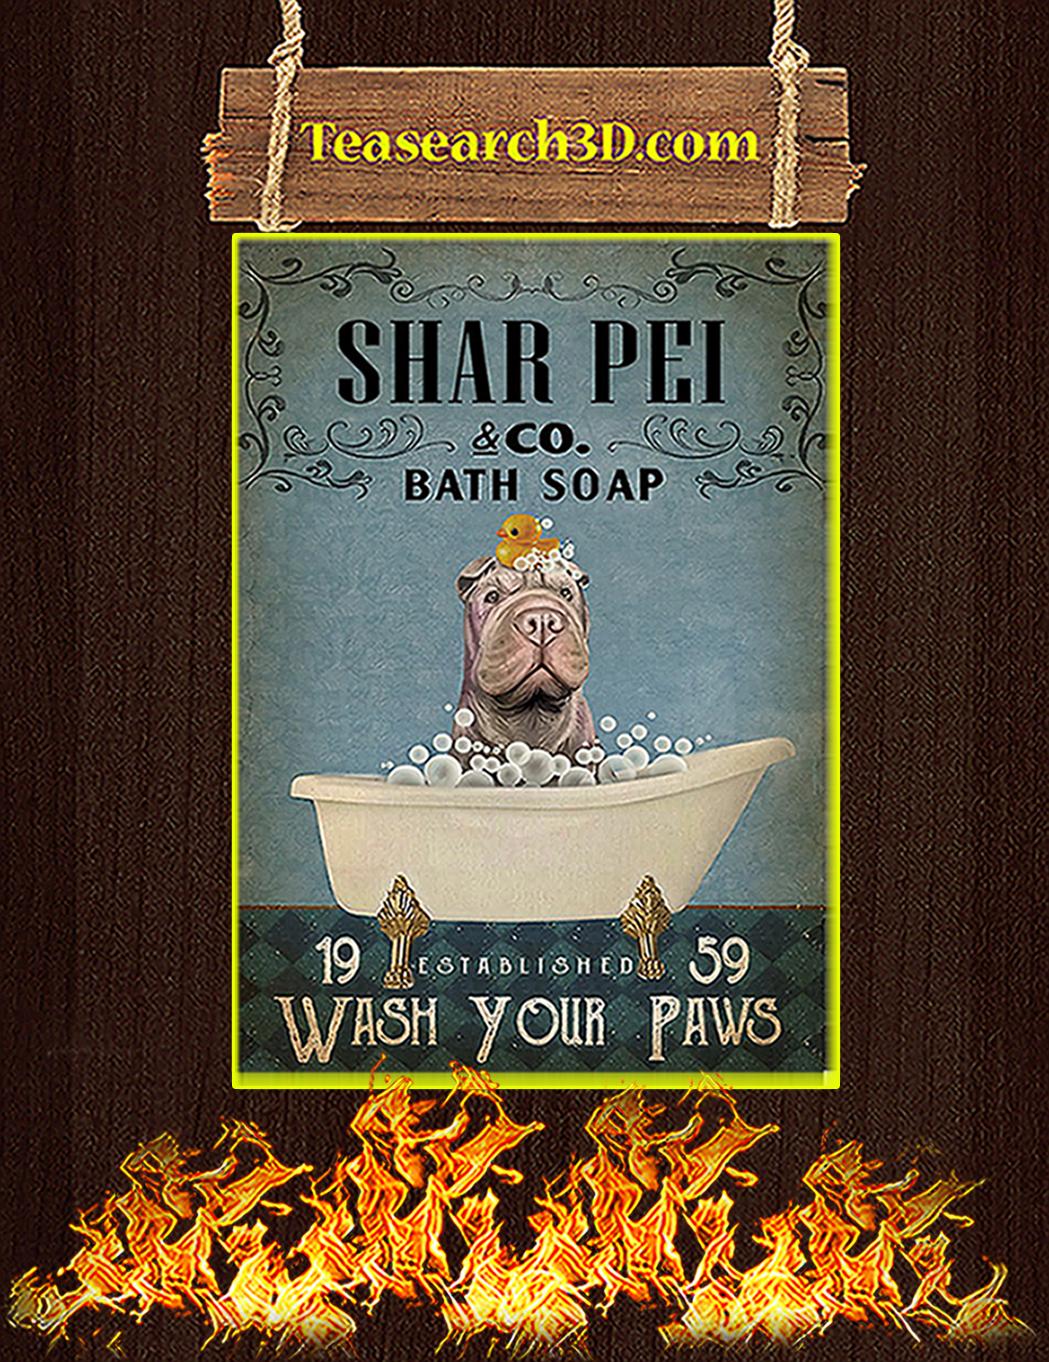 Bath Soap Company Shar Pei Poster A1